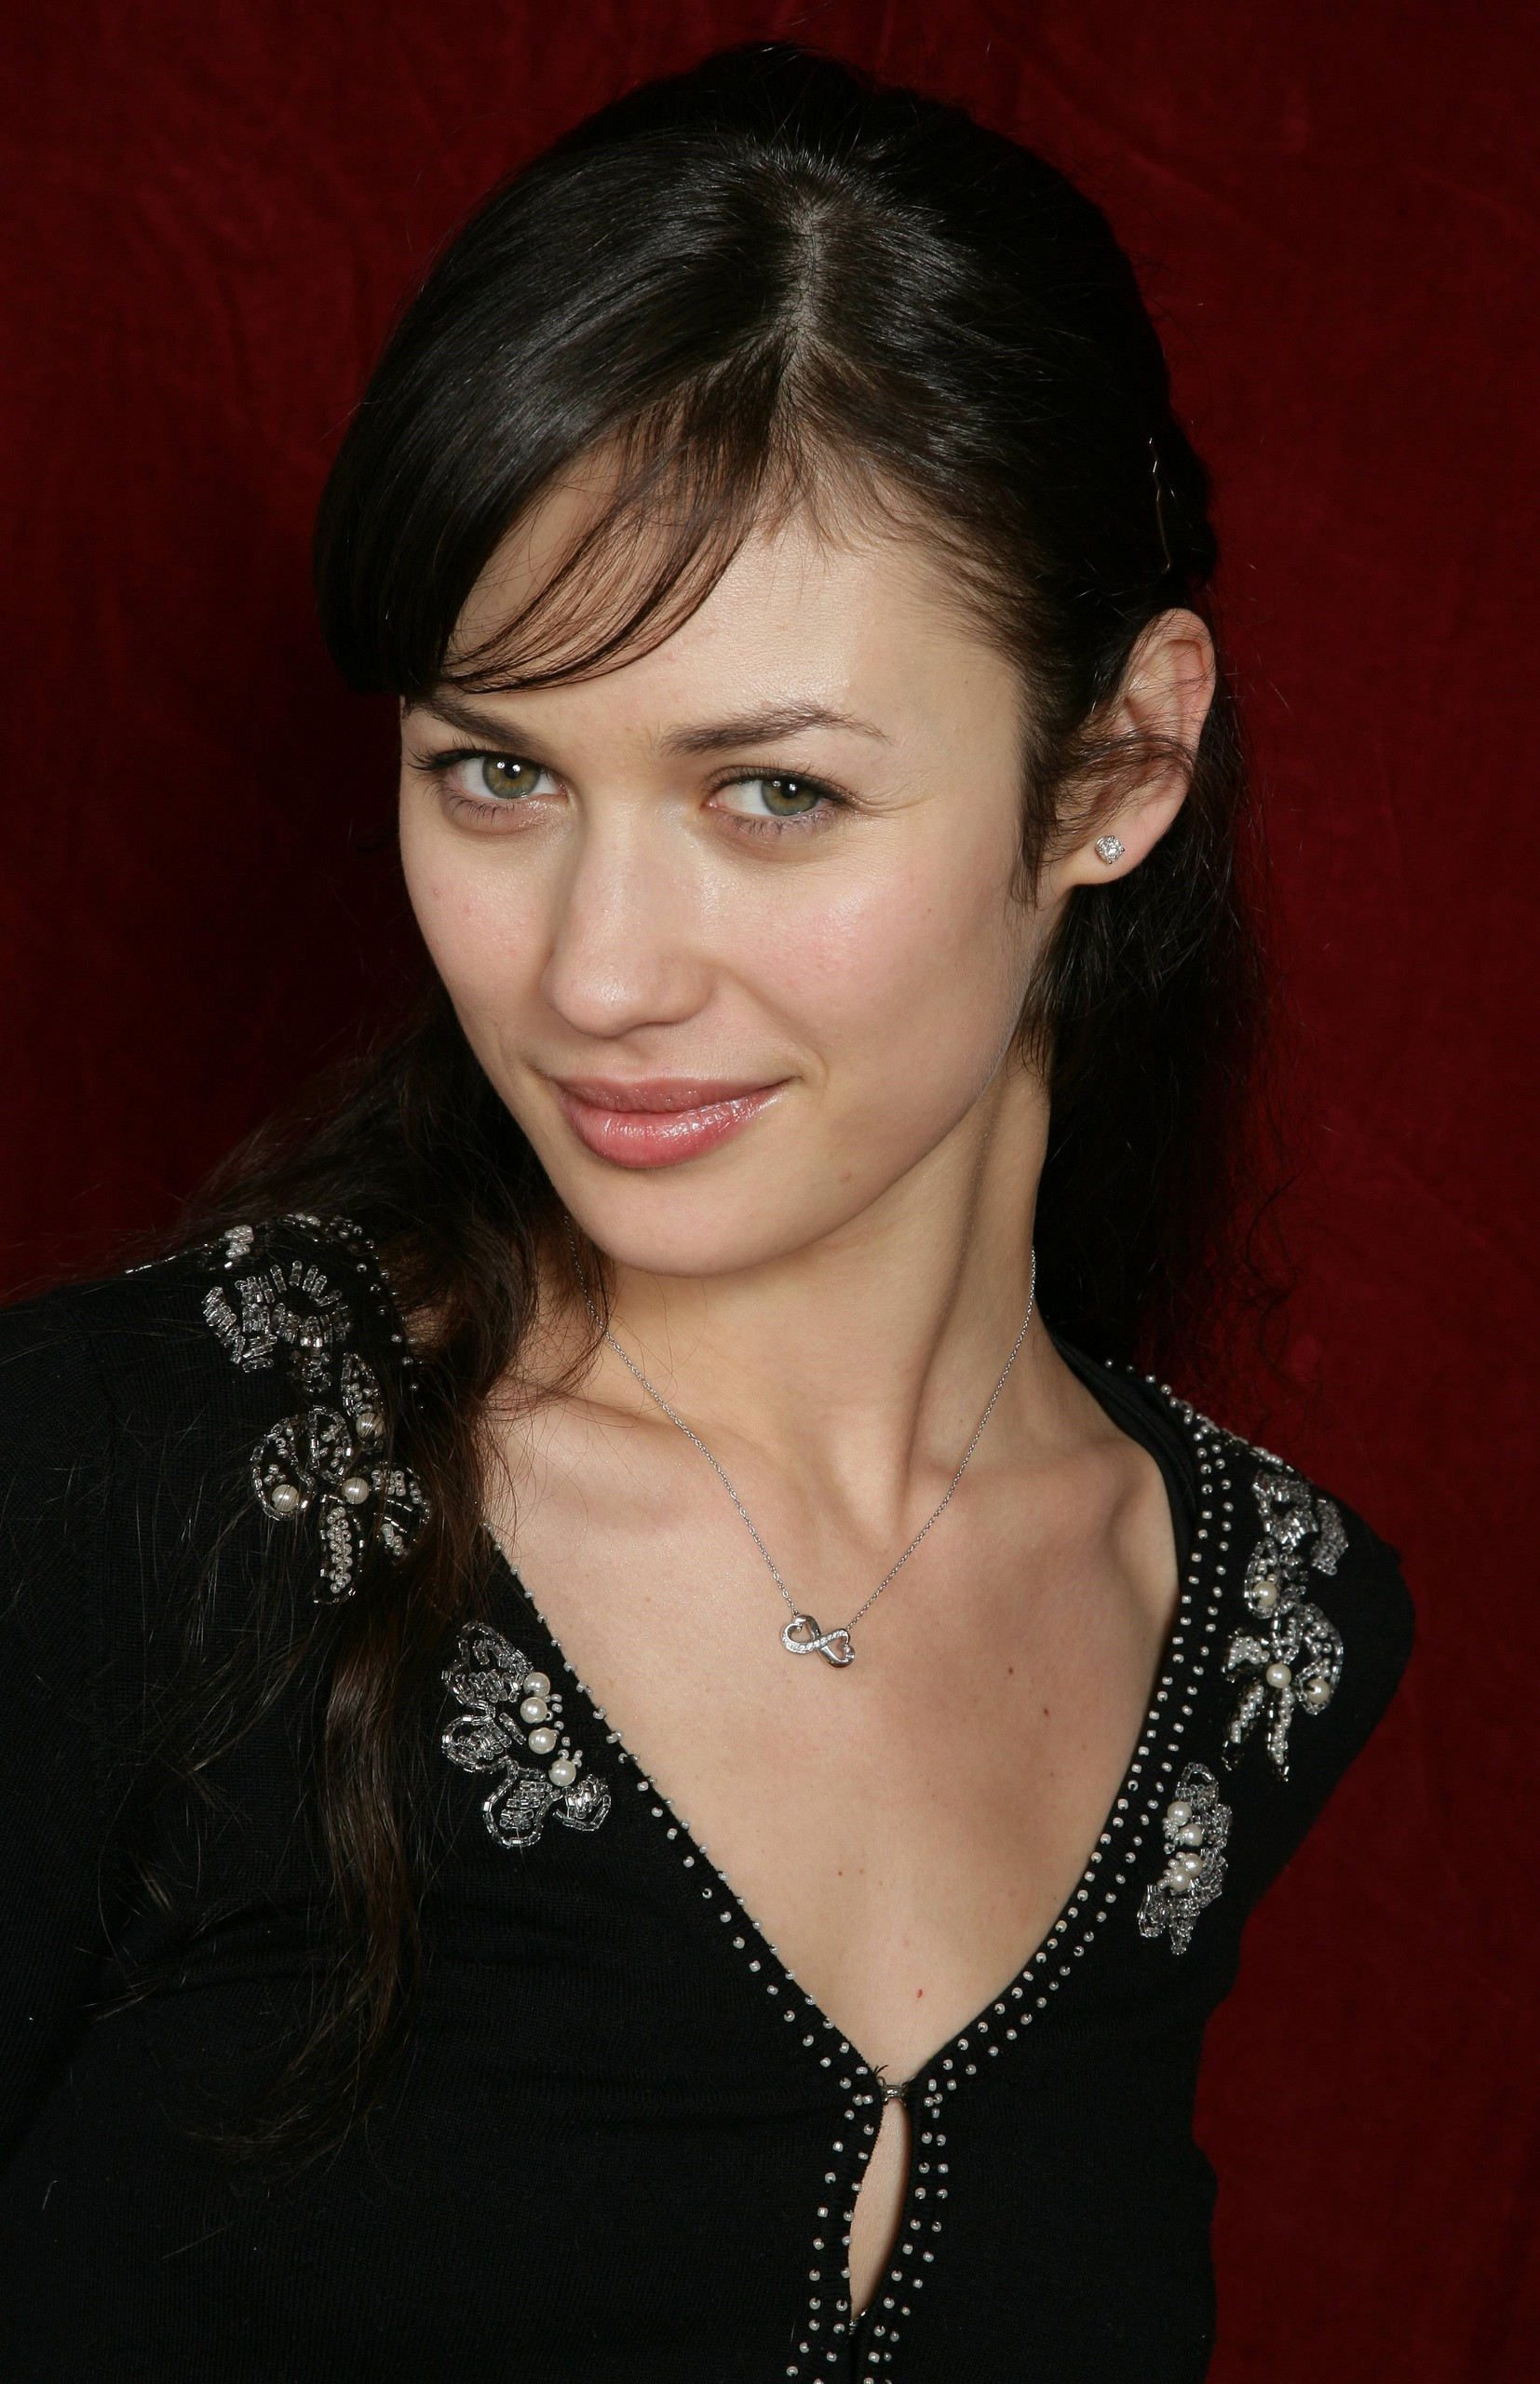 Olga - Olga Kurylenko Photo (6787173) - Fanpop Olga Kurylenko